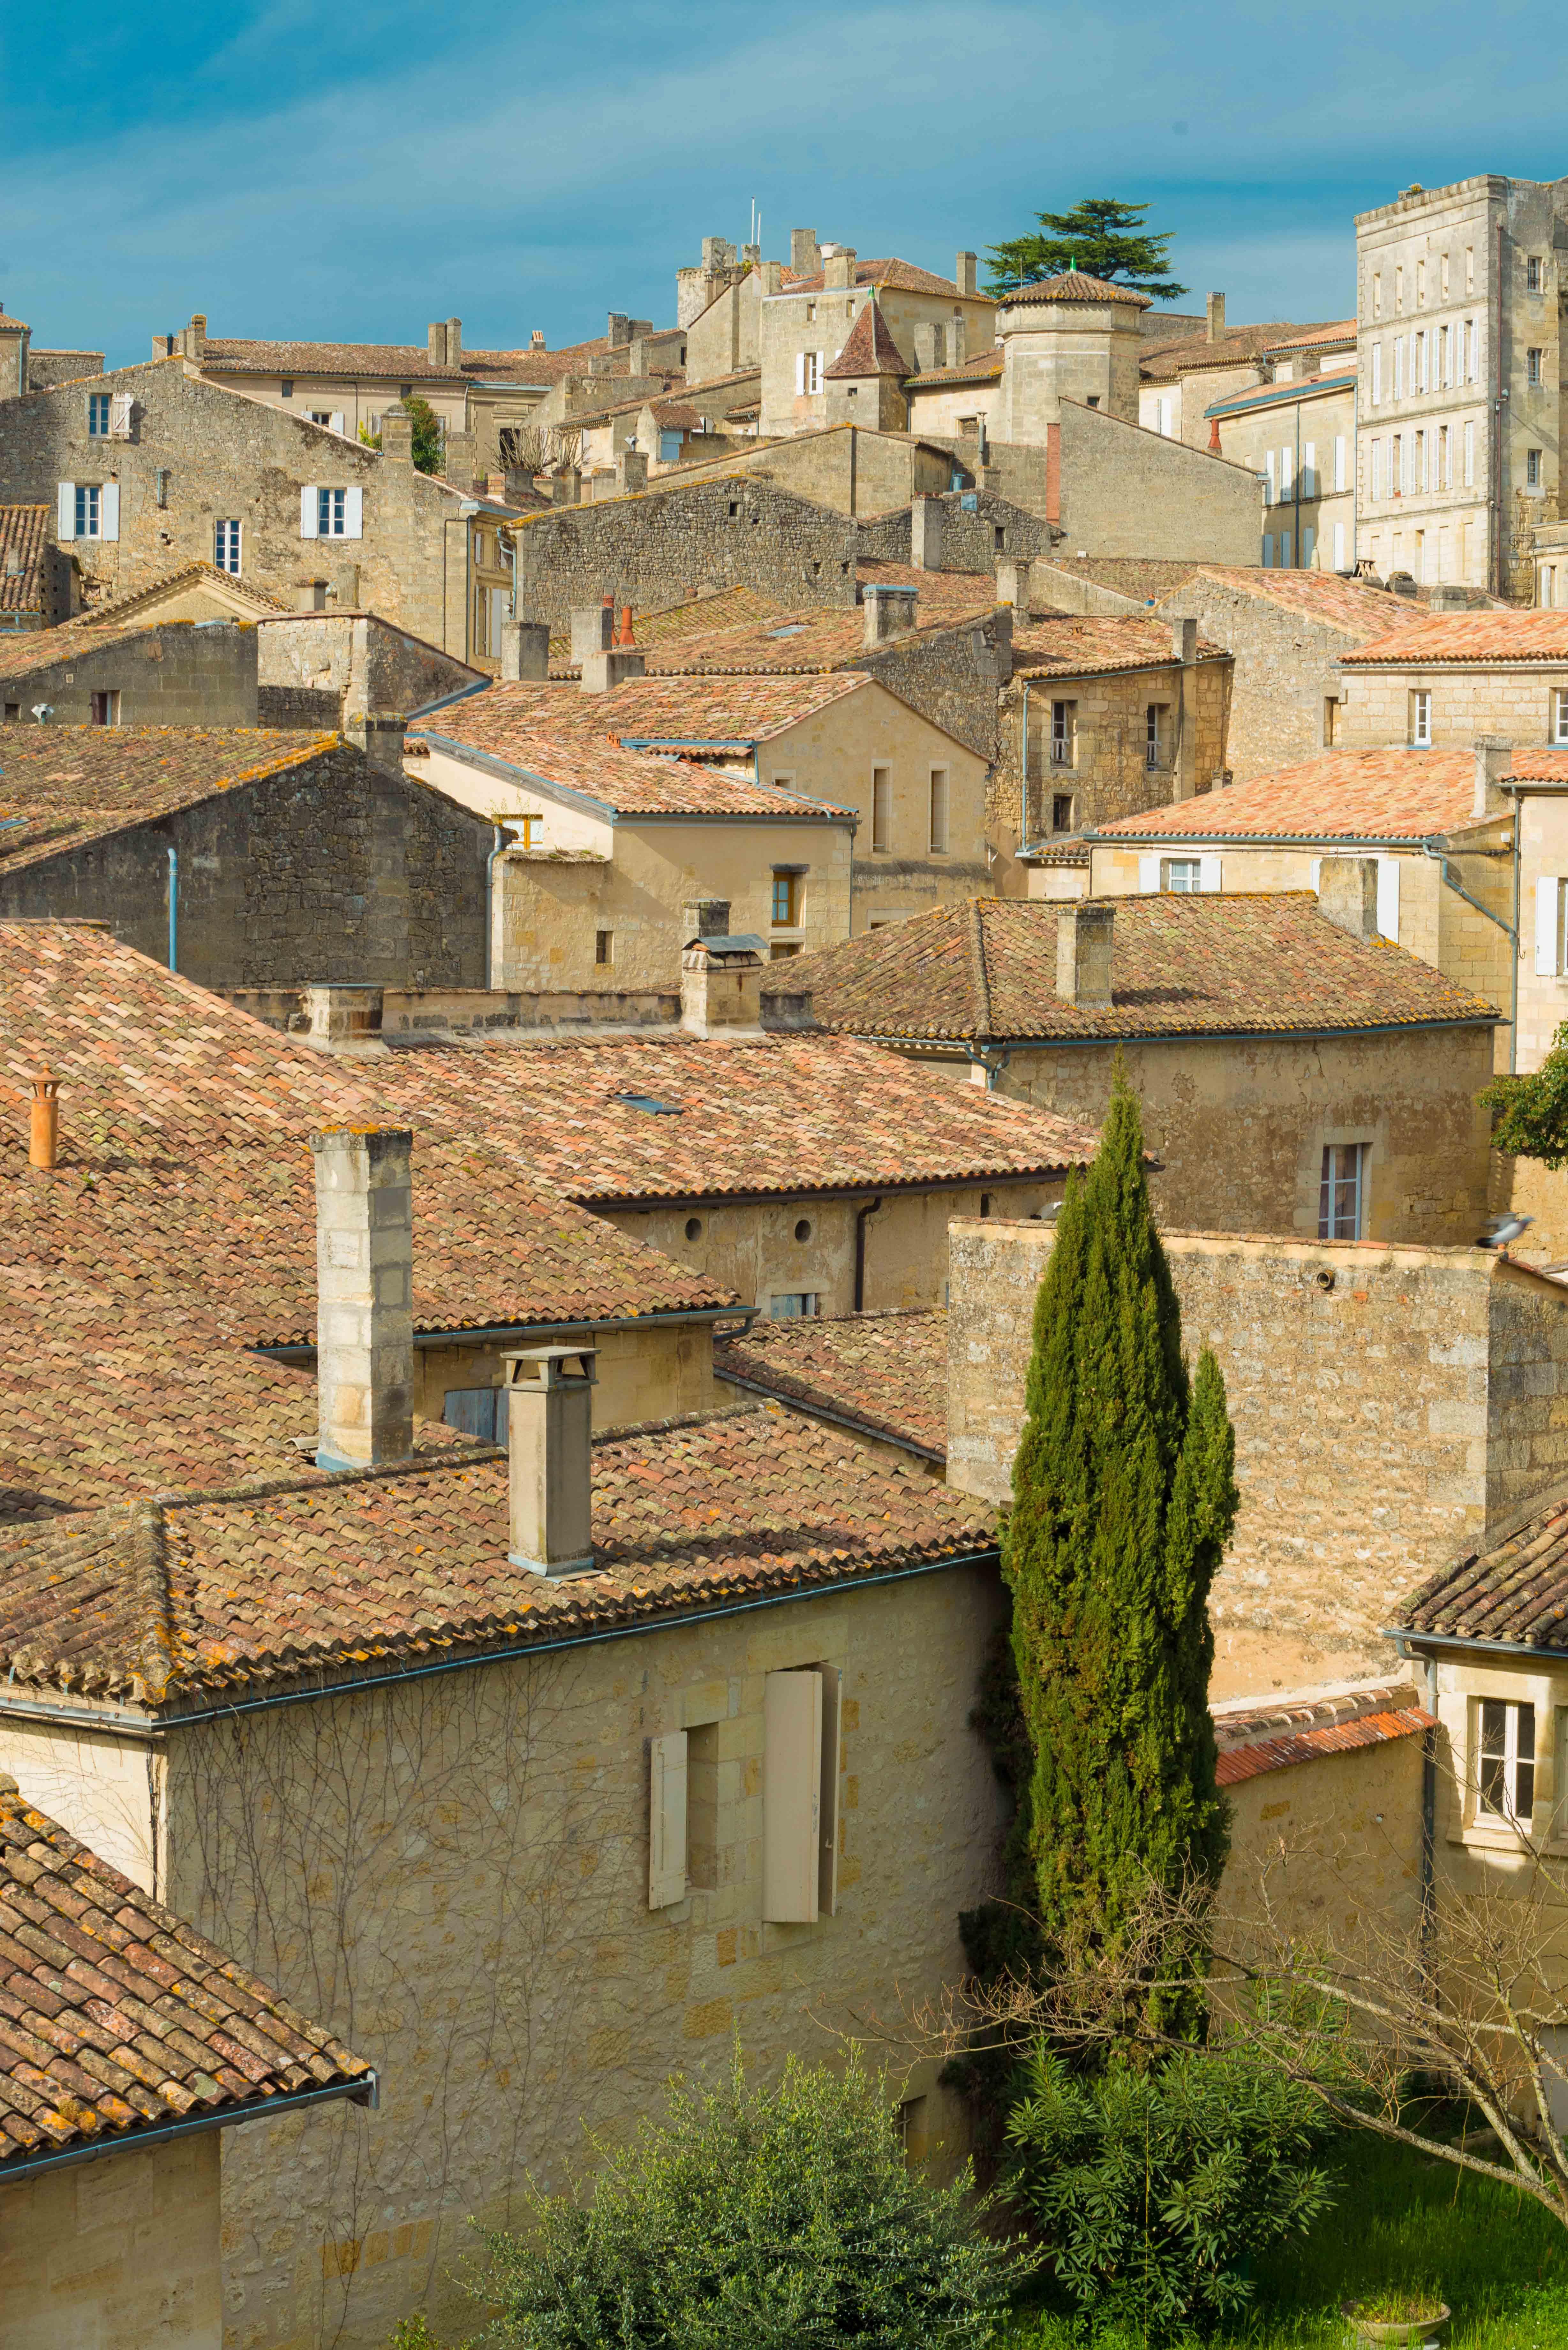 France 2015  -  04092015 - 165255 - 001416